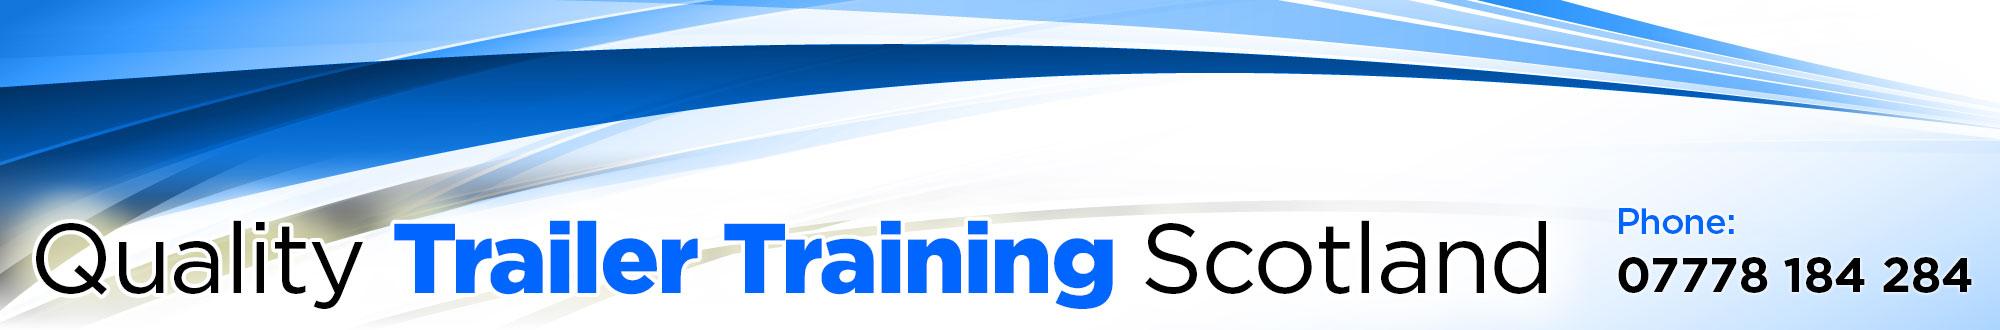 Trailer Training Edinburgh Scotland